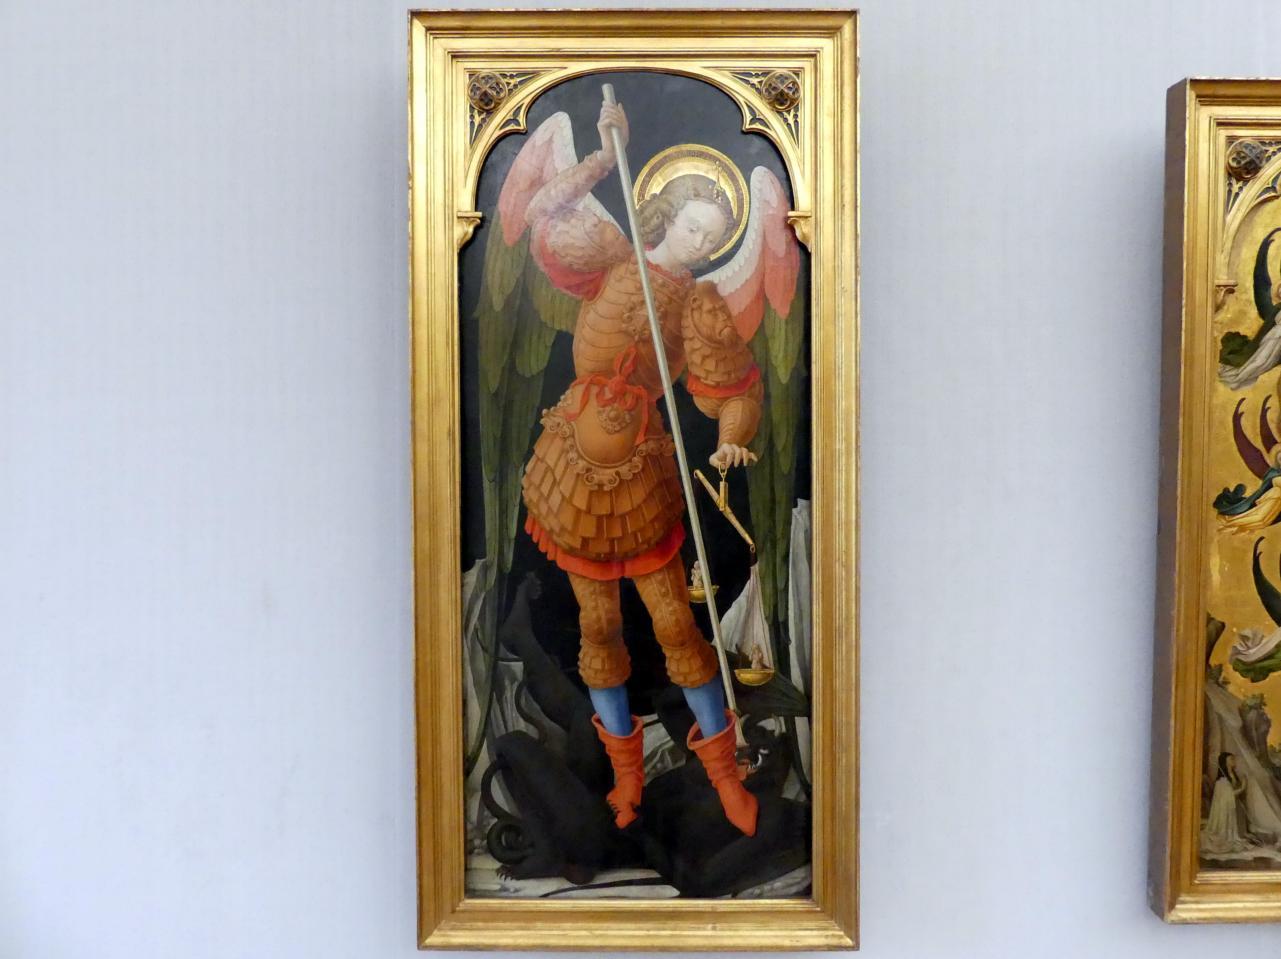 Bartolomeo Vivarini: Der Erzengel Michael mit der Seelenwaage, Undatiert